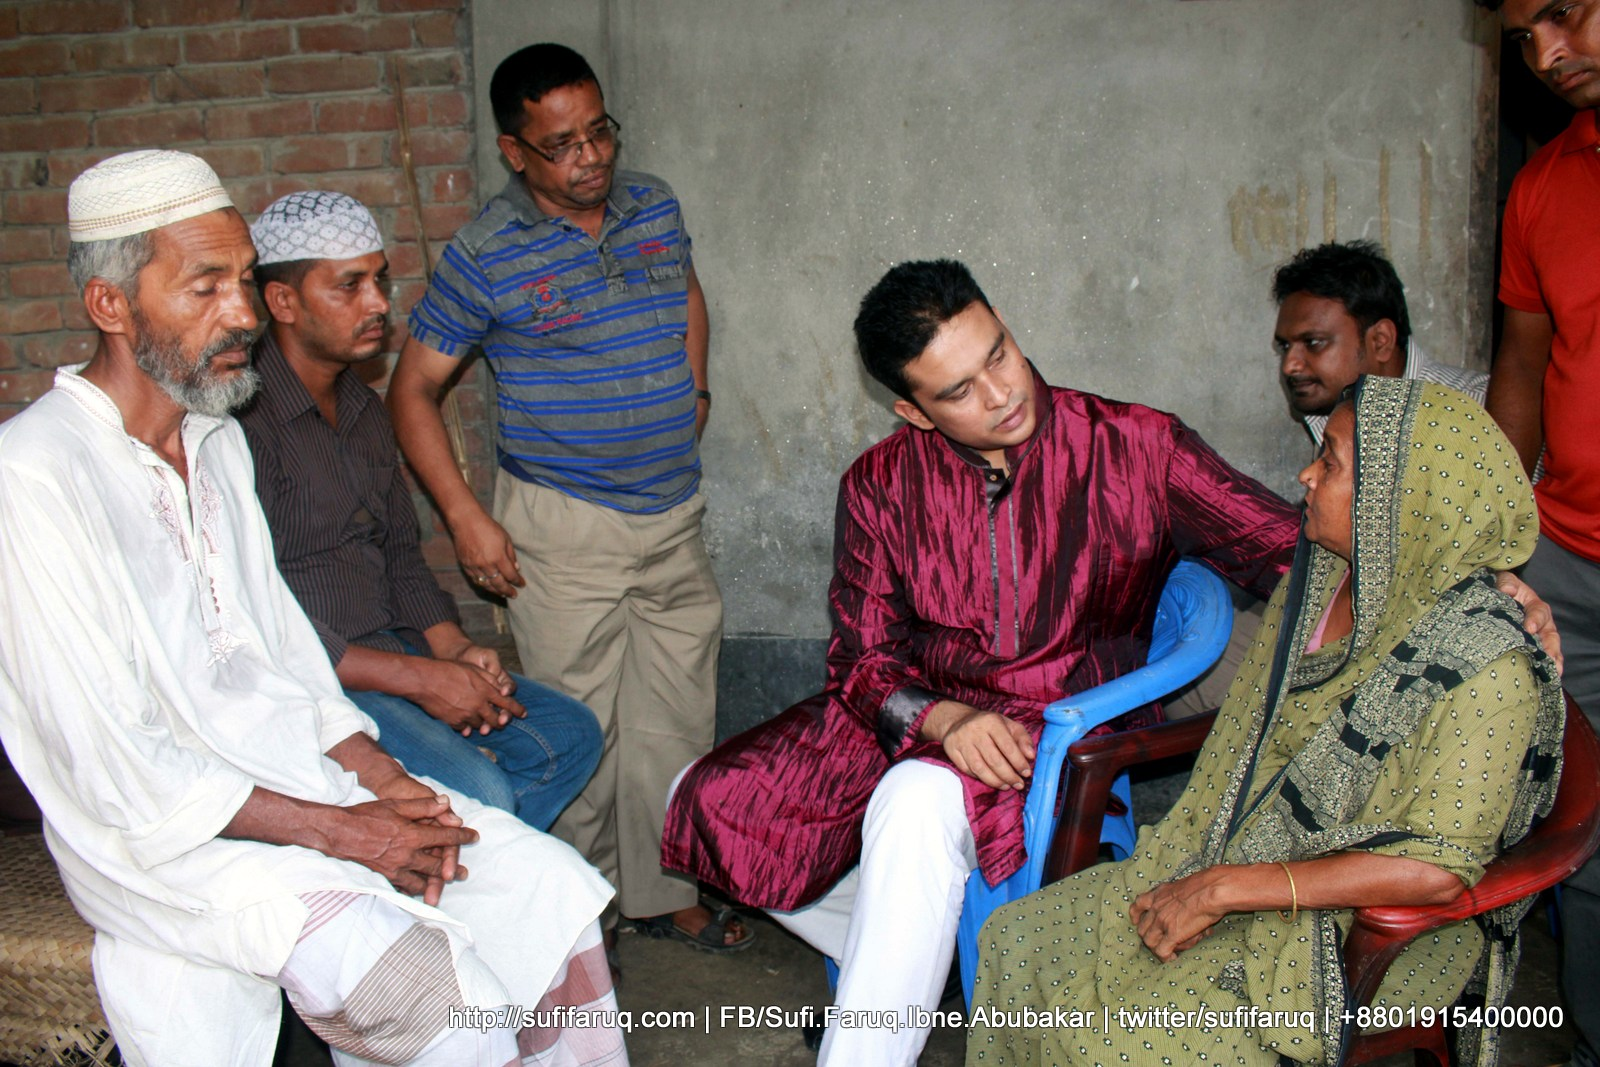 Hannan er Poribar er Shathe Dekha o kobor jiyarot Mulgram Panti 67 কুমারখালির পান্টি ইউনিয়নের দক্ষিণ মুলগ্রামের আমাদের সহযোদ্ধা, আব্দুল হান্নান এর মৃত্যুবার্ষিকীতে ফাতেহা পাঠ ও পরিবারের সাথে সাক্ষাৎ